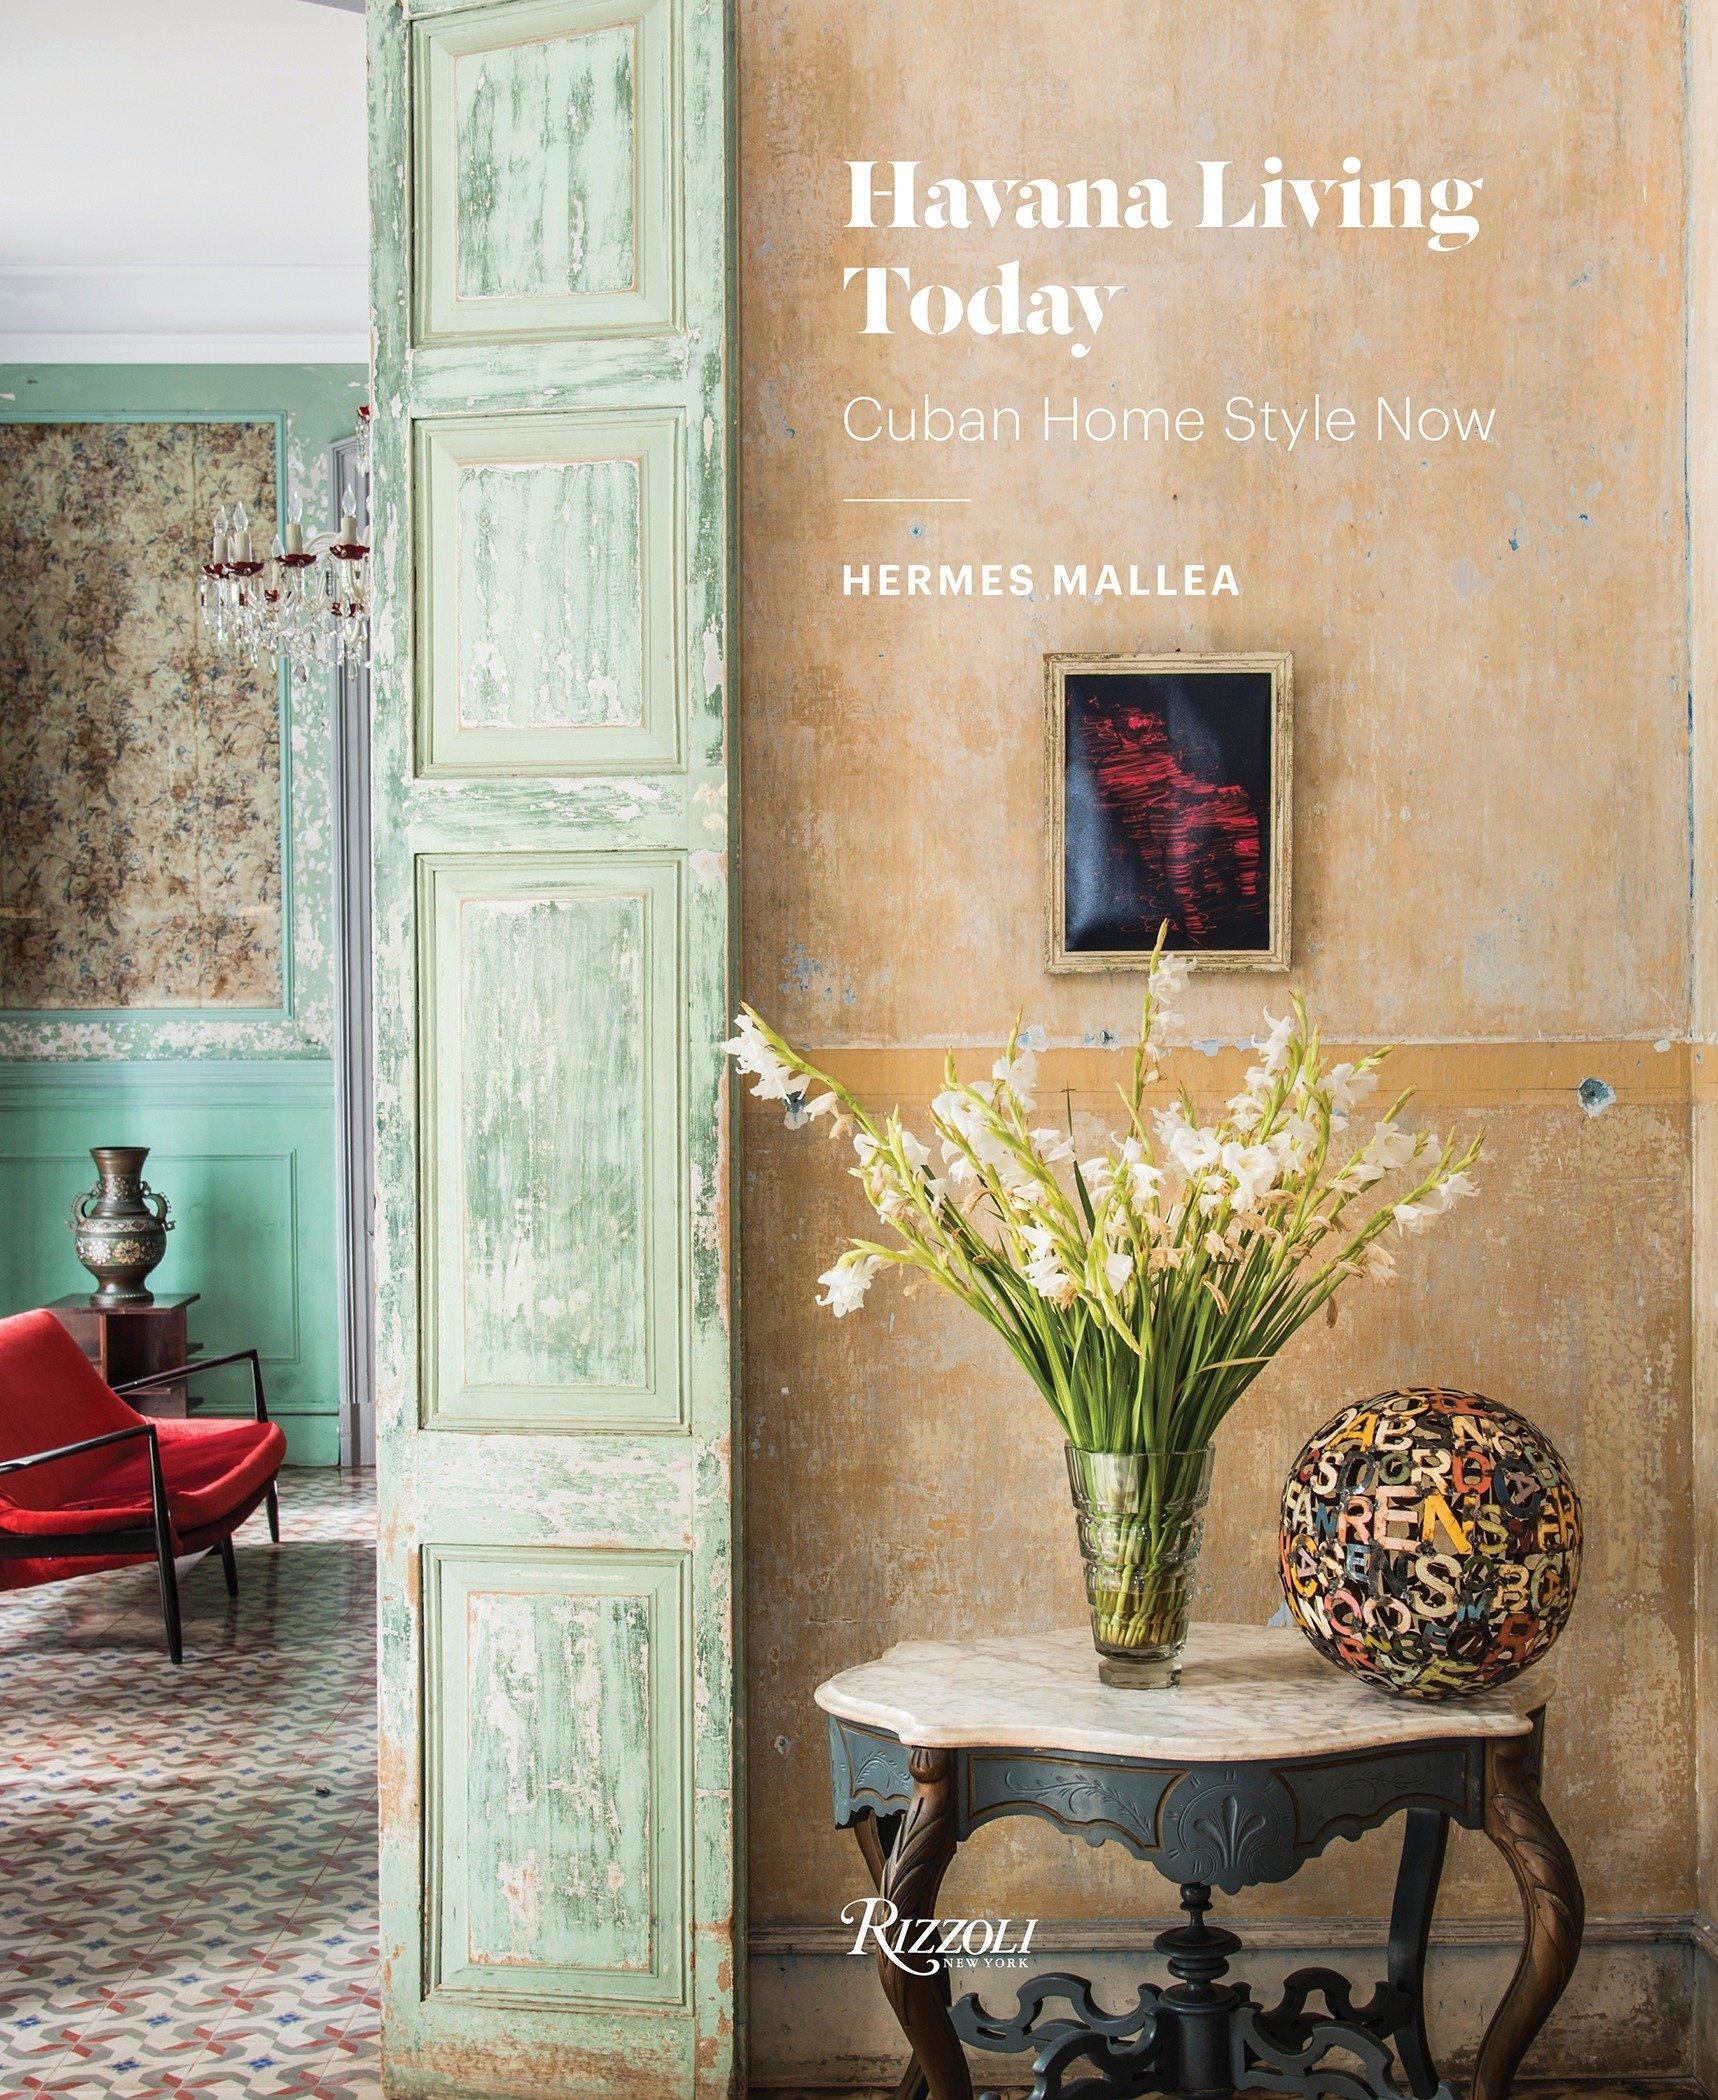 Hermes Mallea Offers A Dazzling Look At Cuban Design U2013 Repeating Islands